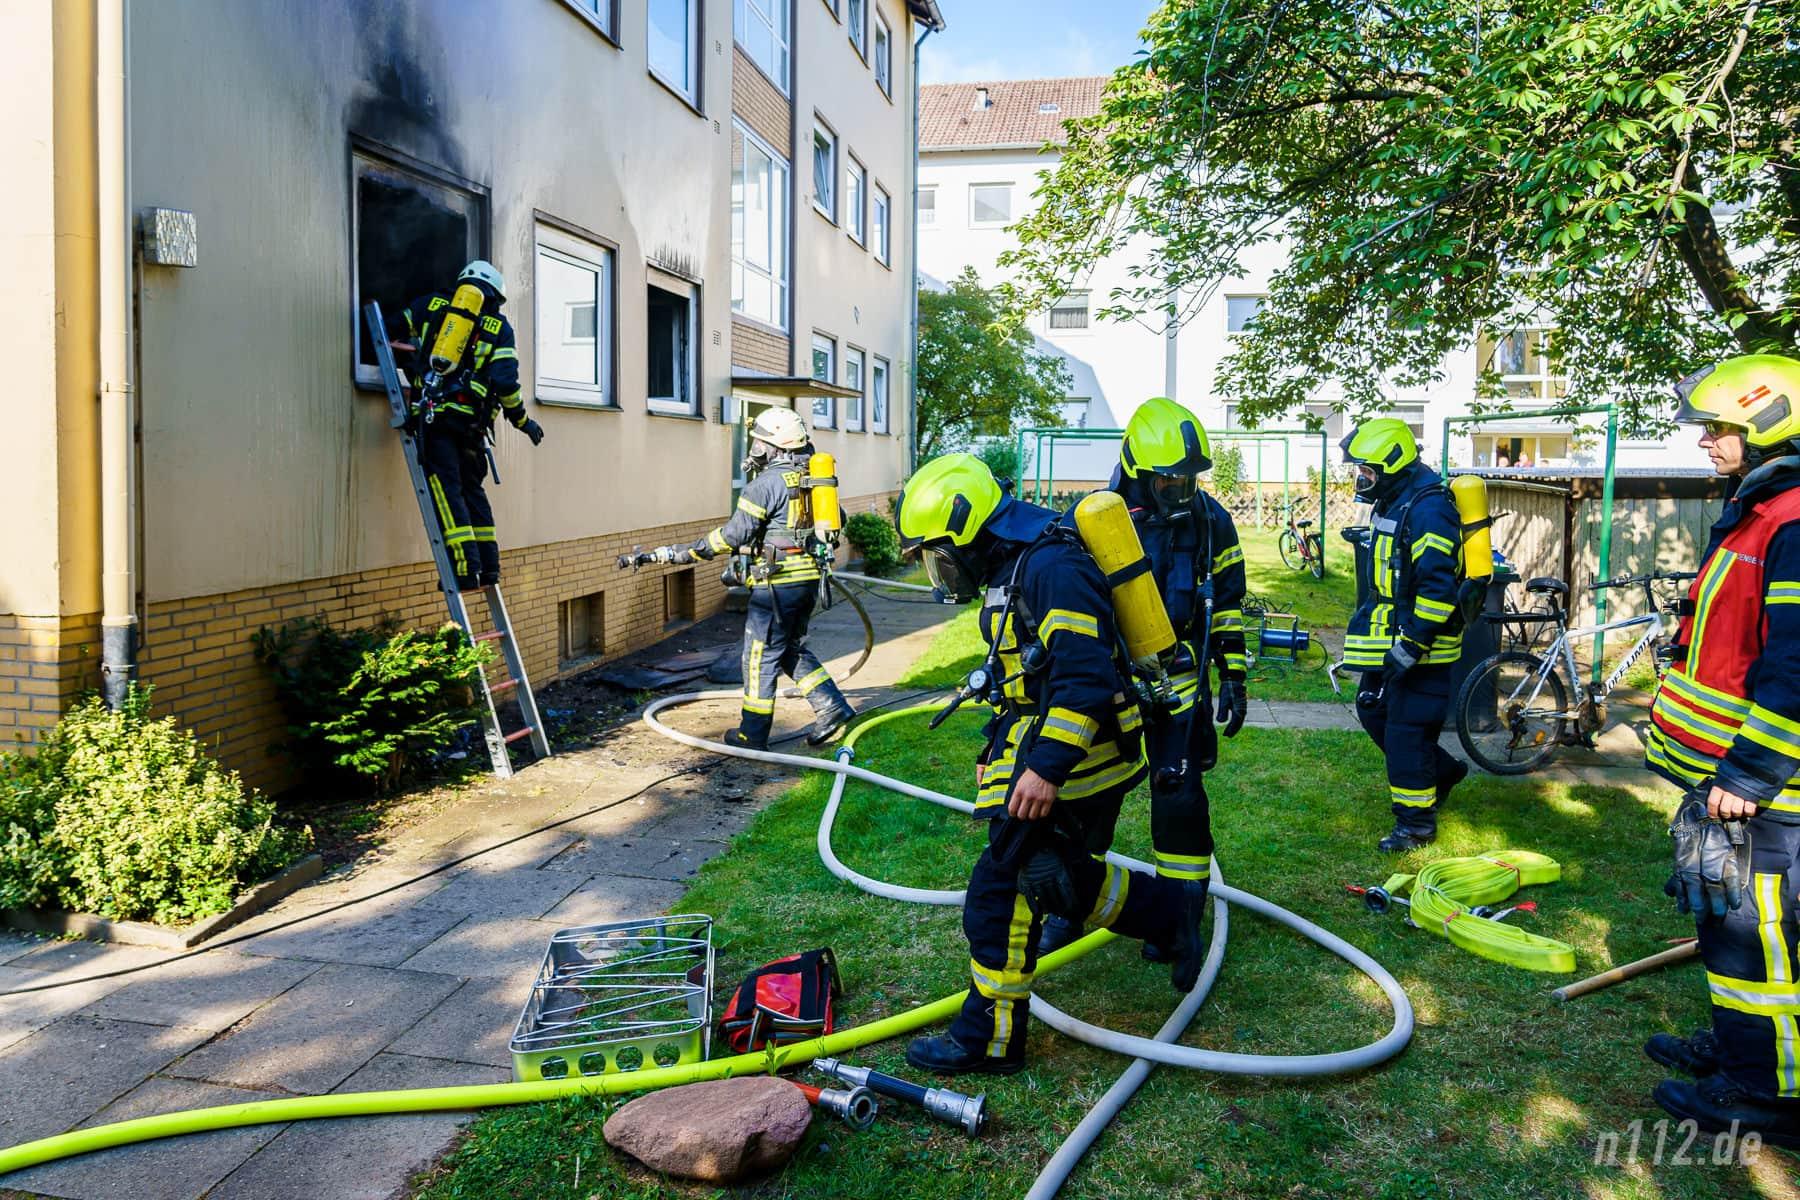 Feuerwehreinsatz an der Horster Straße (Foto: n112.de/Stefan Simonsen)